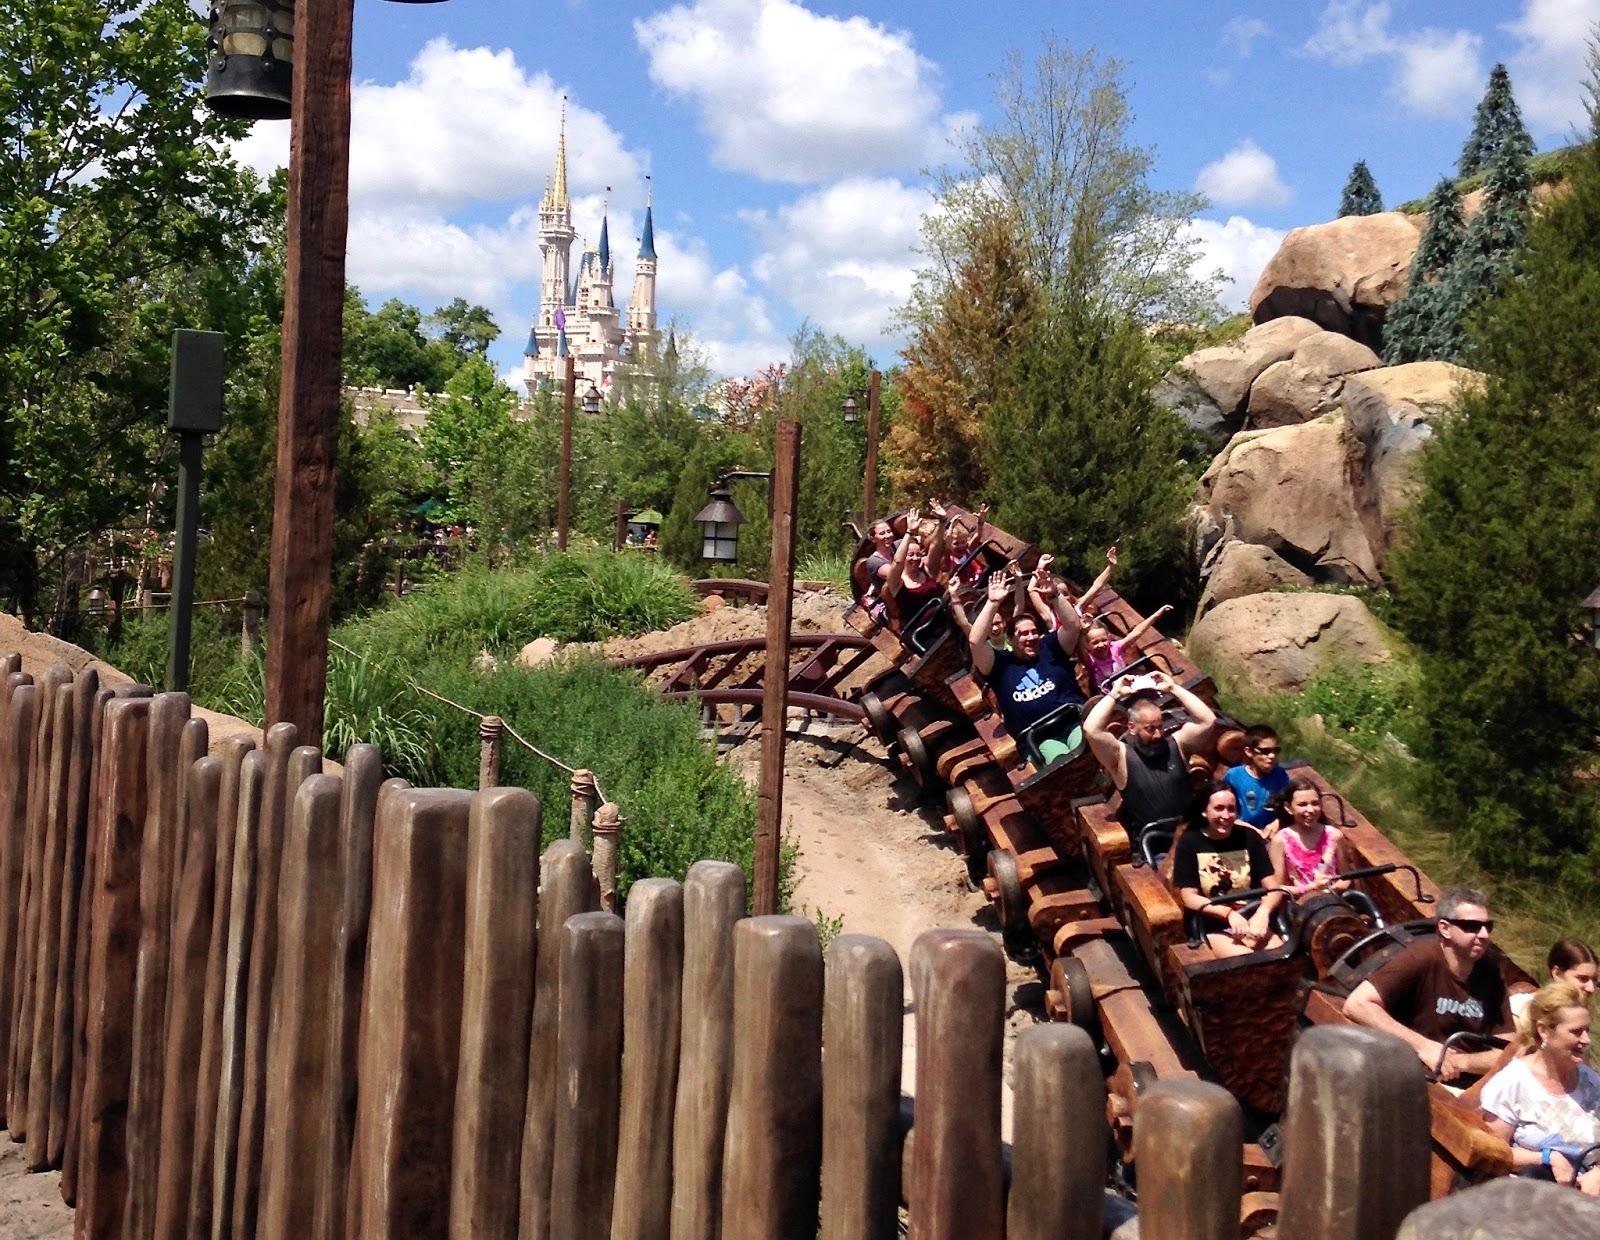 Magic-Kingdom-Seven-Dwarfs-Mine-Train-ride-Disney-World-Orlando-Florida